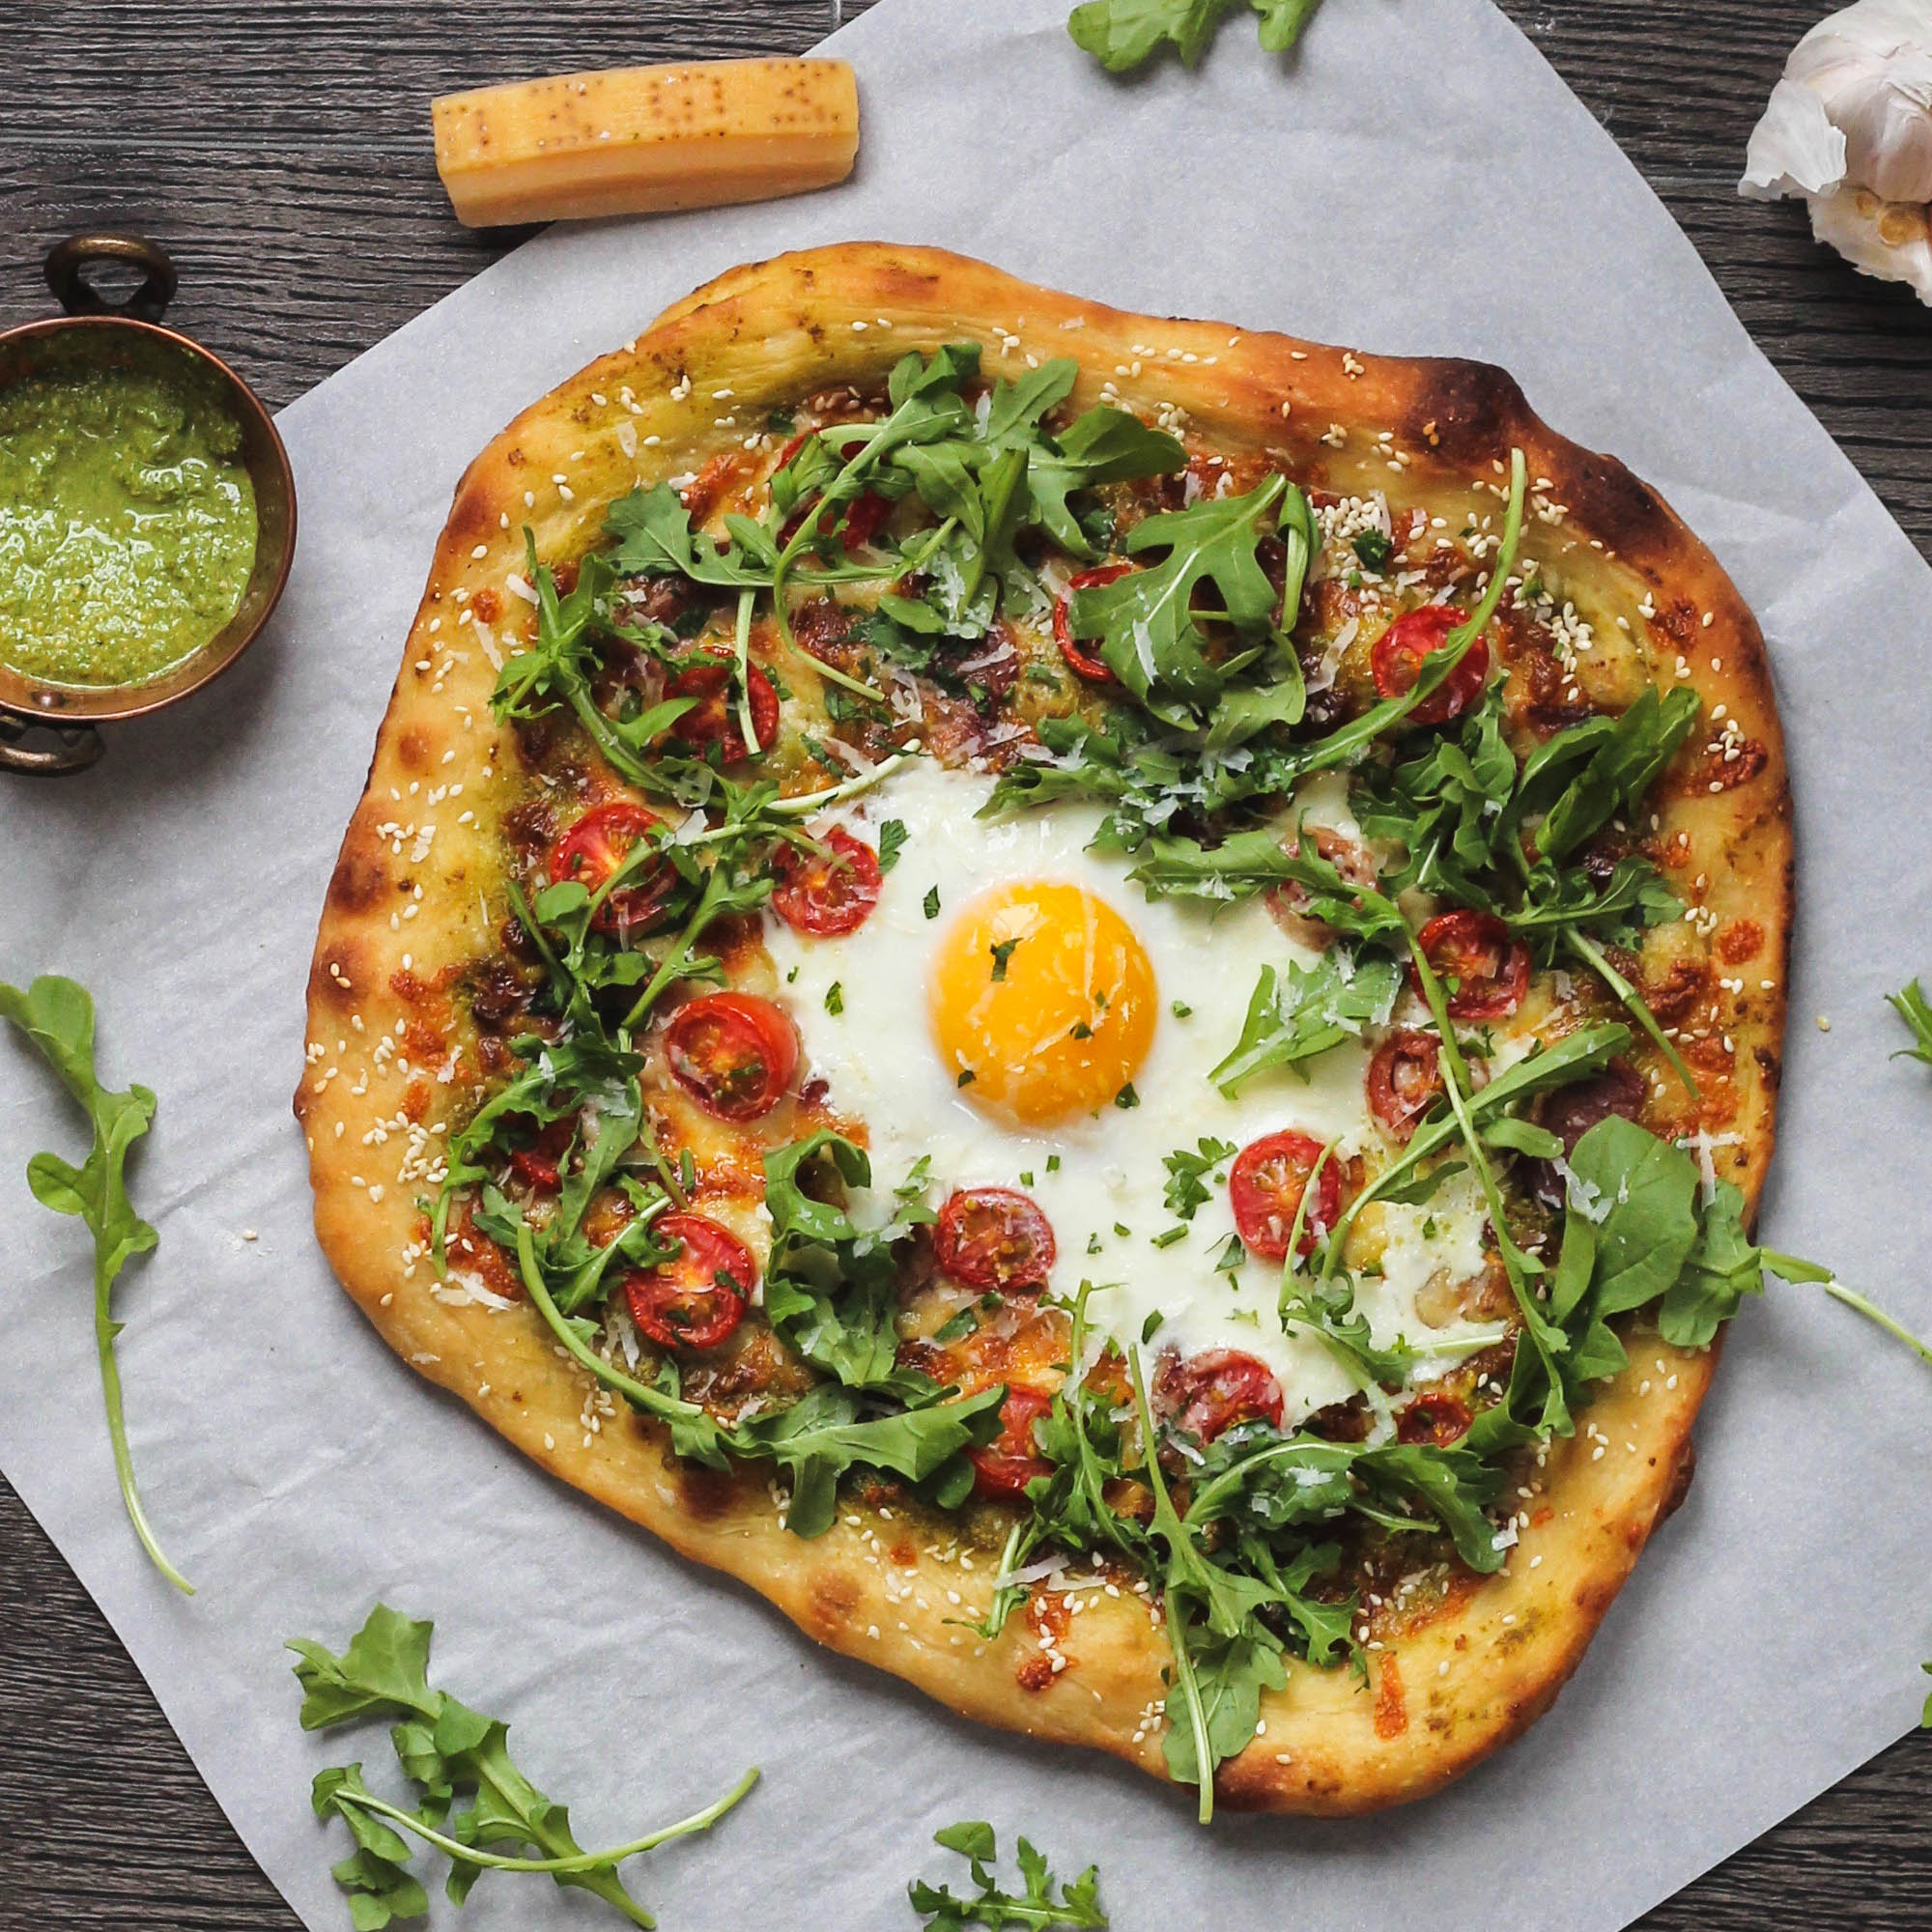 BREAKFAST PIZZA: BACON, EGG + PESTO